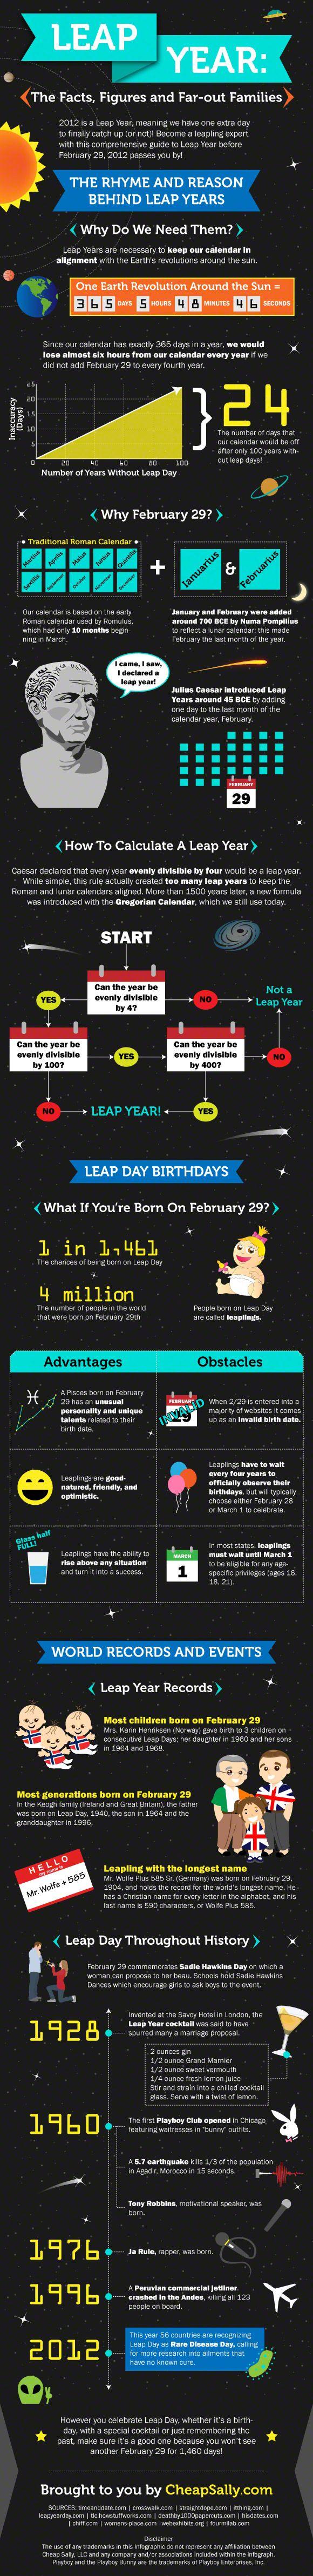 CheapSally.com Leap Year Infographic #inforgraphic #marketingmaterial